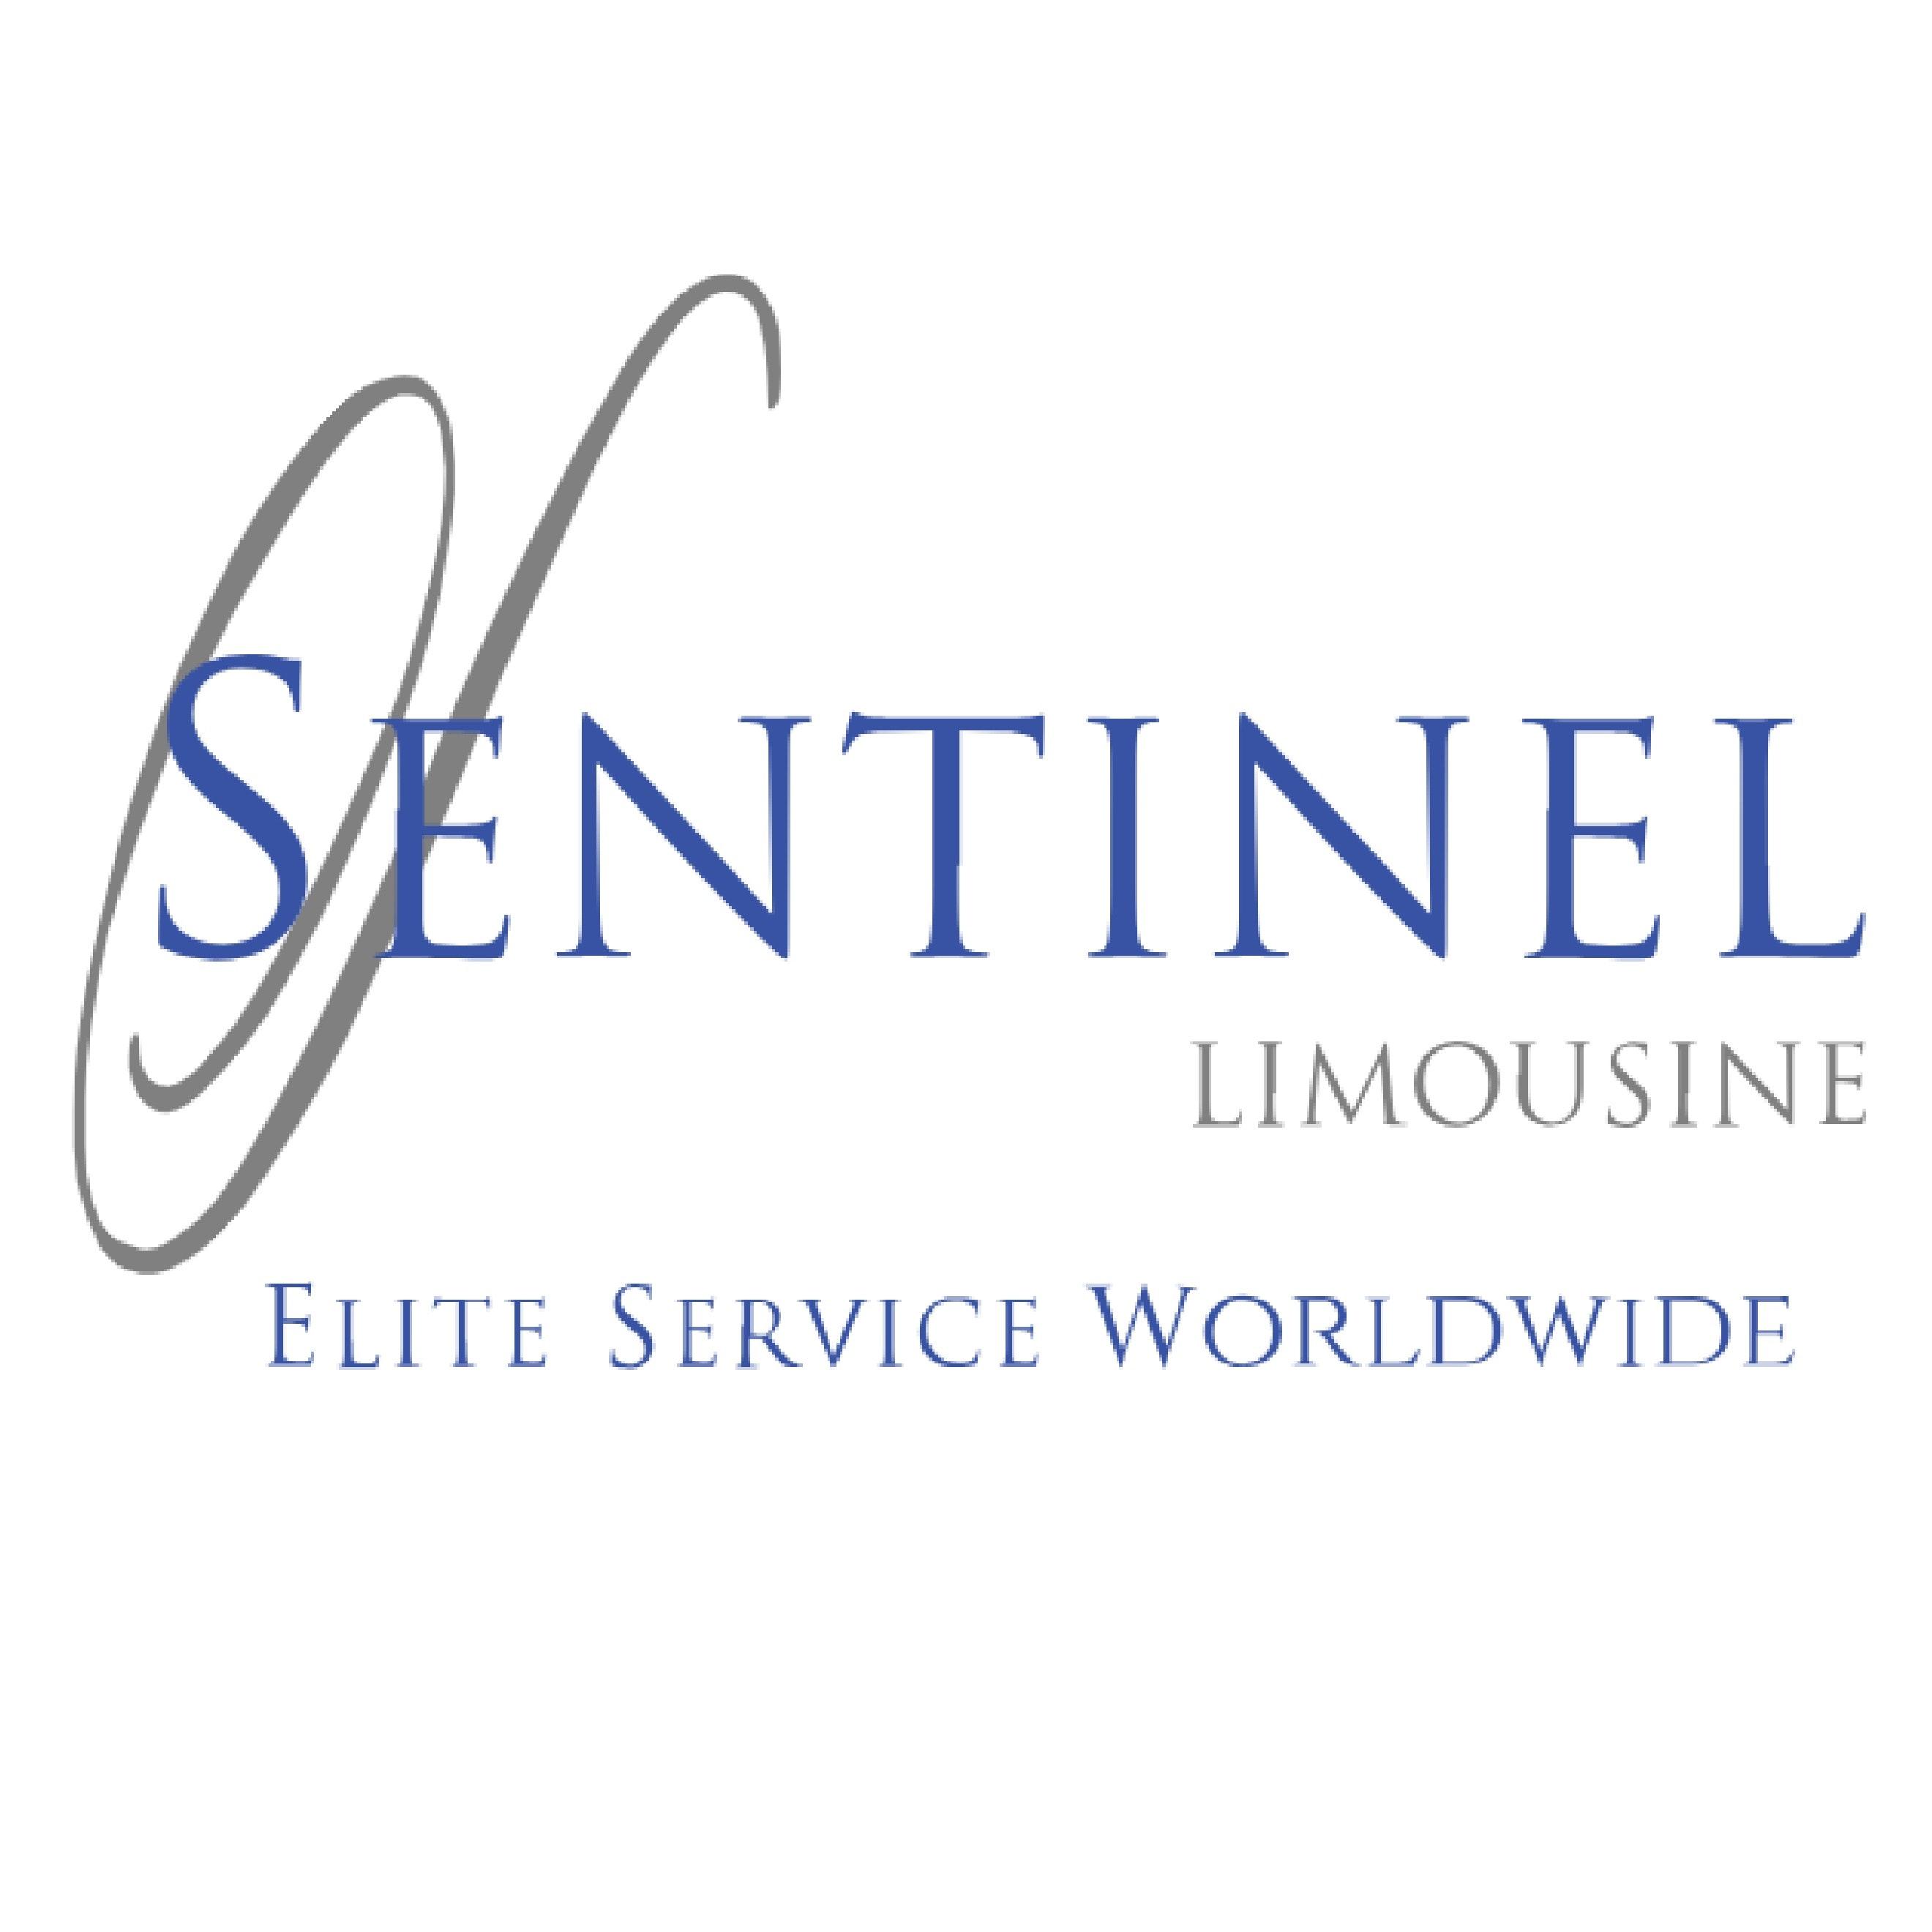 Sentinel Limousine logo